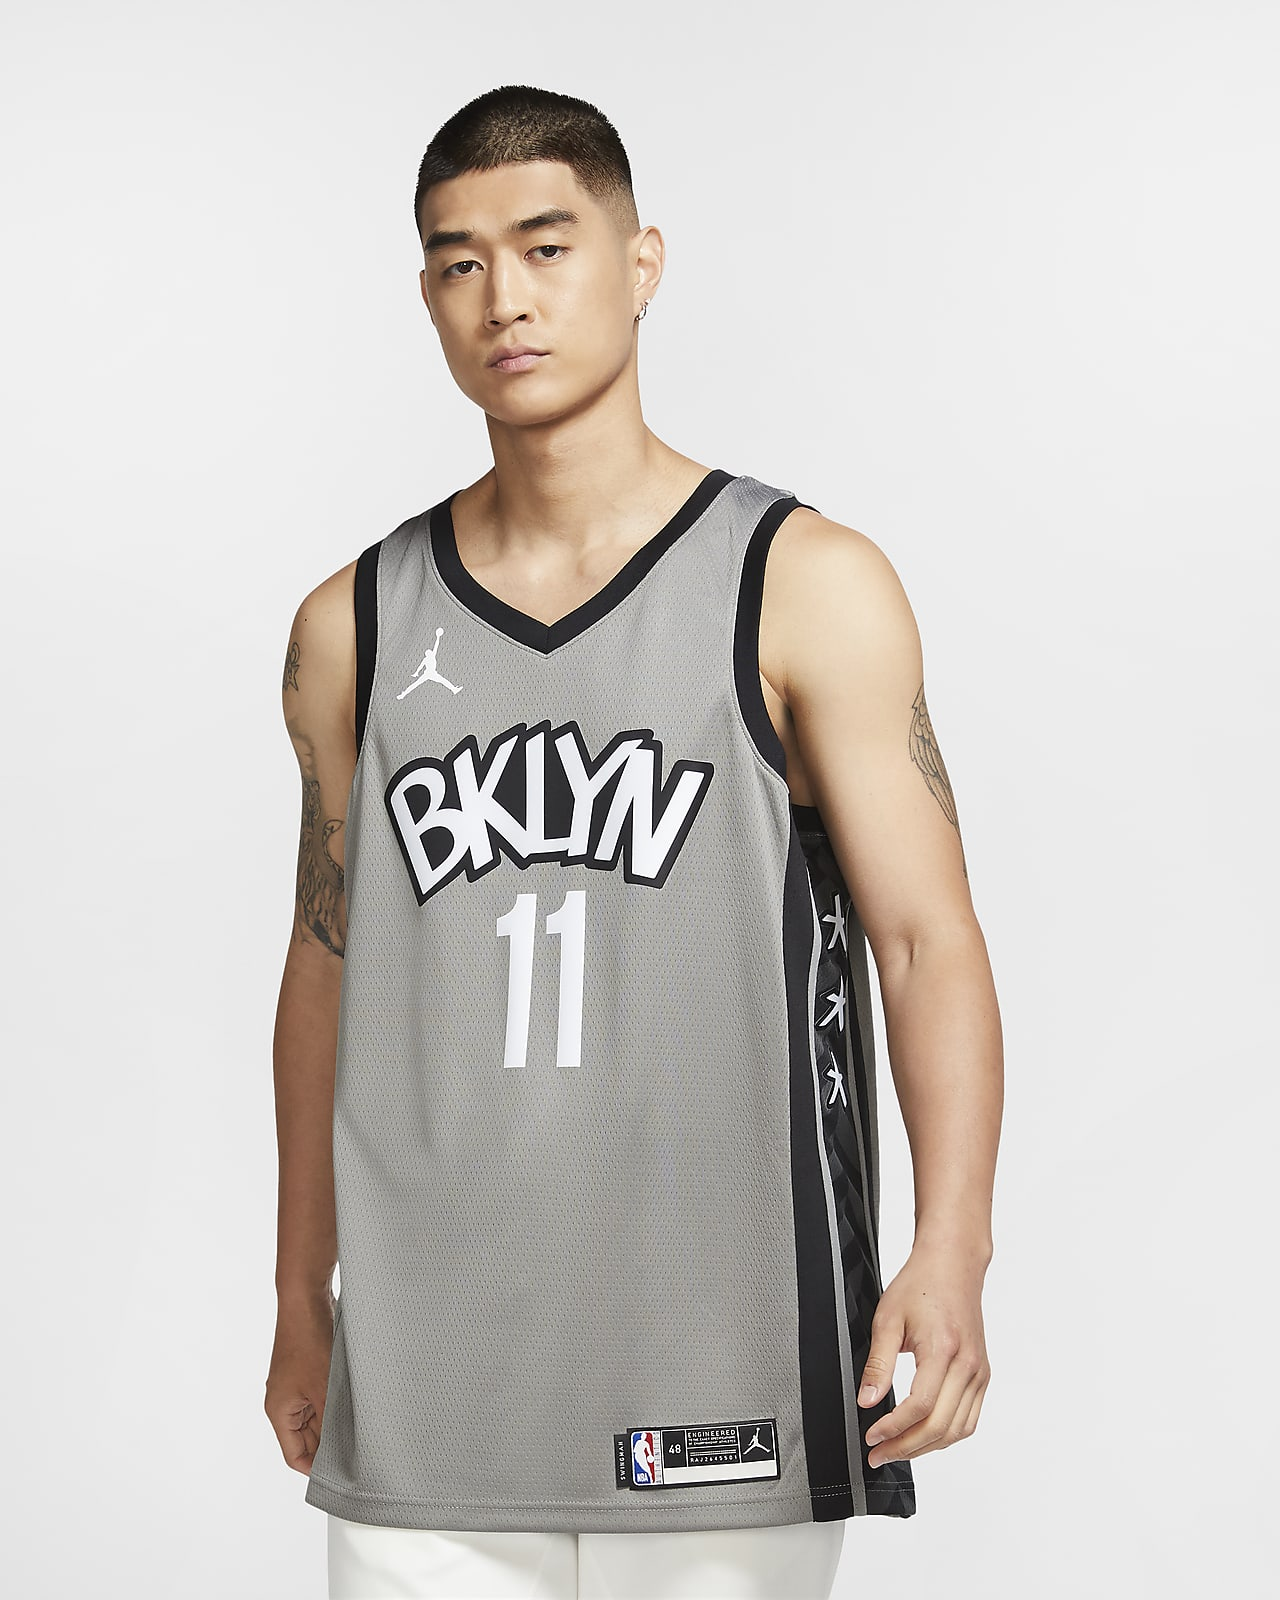 Camisola NBA da Jordan Swingman Kyrie Irving Nets Statement Edition 2020